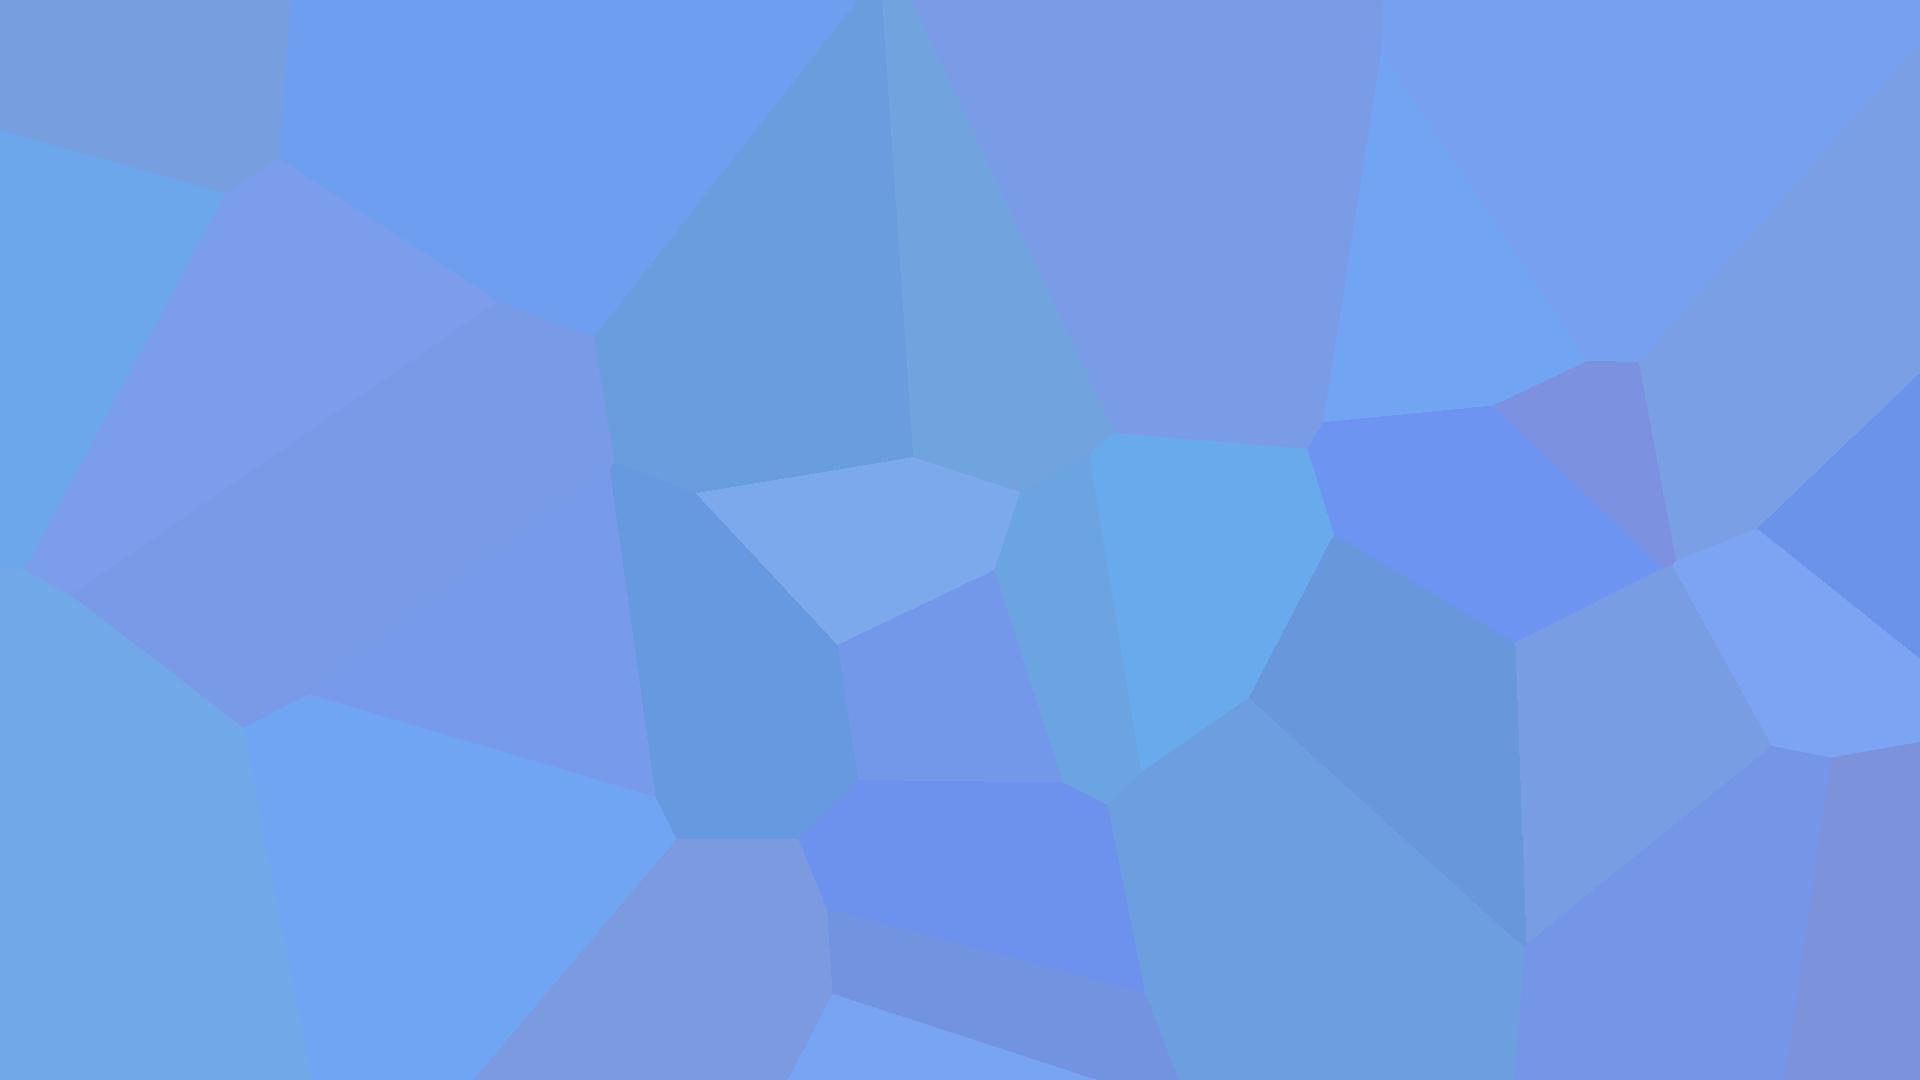 Blue Shard 1080x1920 Need Iphone 6s Plus Wallpaper Background For Iphone6splus Follow Iphone 6s Plus 3wallpapers Wallpaper Hd Wallpaper Background S